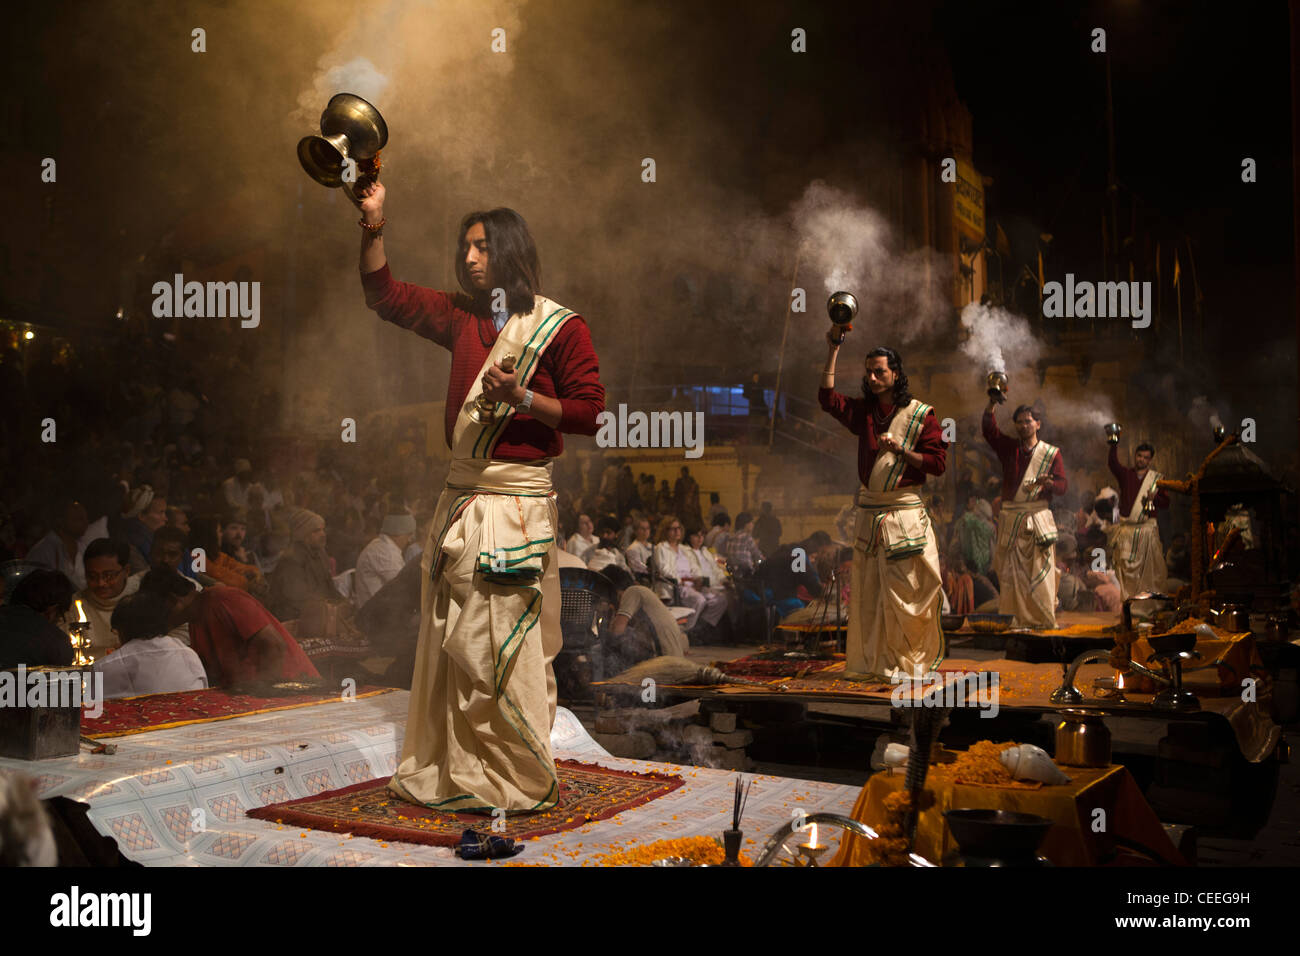 India, Uttar Pradesh, Varanasi, Dasaswamedh Ghat, Ganga Aarti vedica cerimonia puja sacerdote brucia incenso Immagini Stock